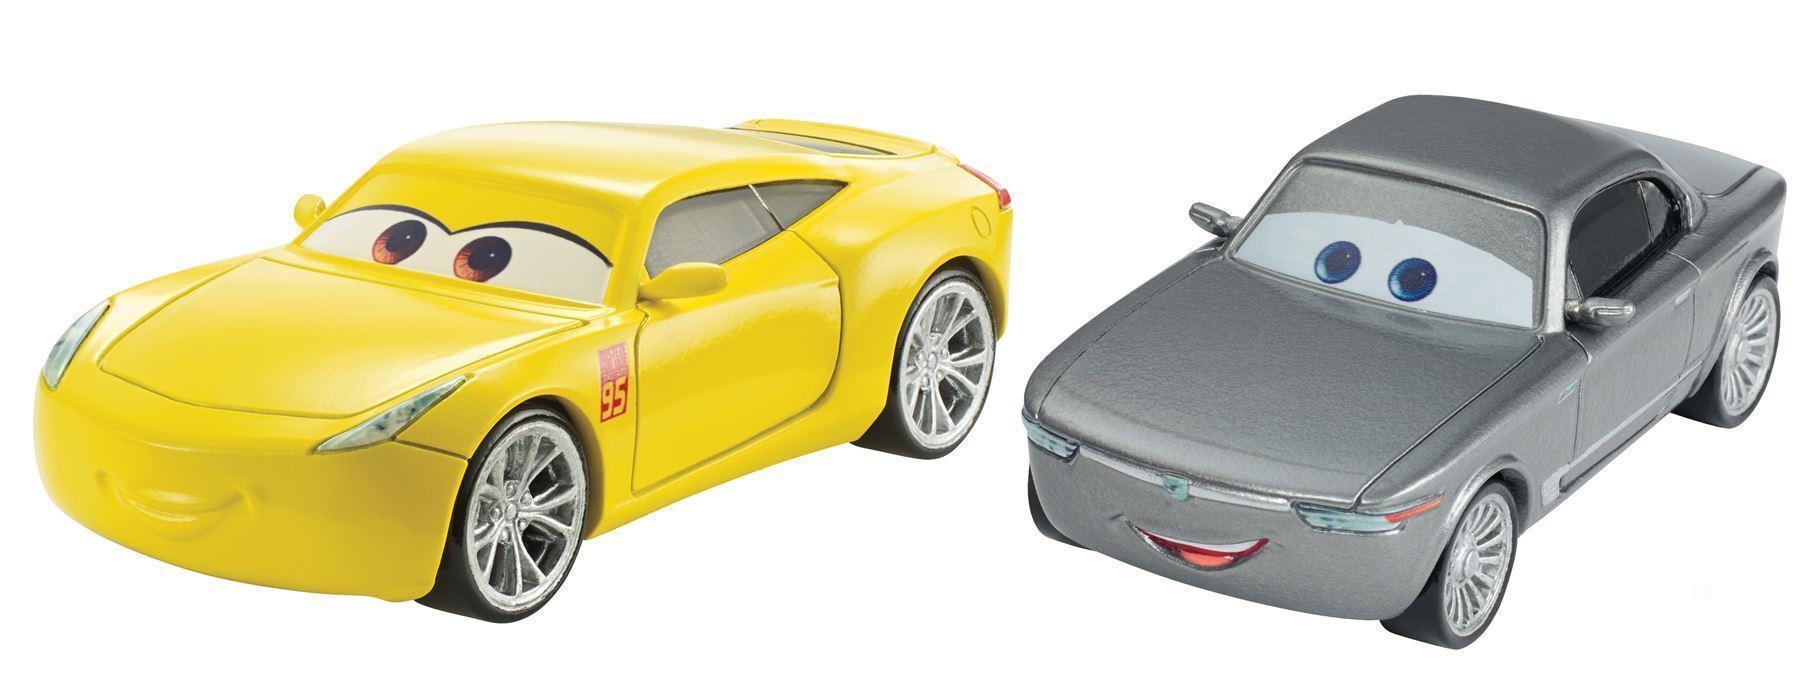 MATTEL Véhicule Cars3